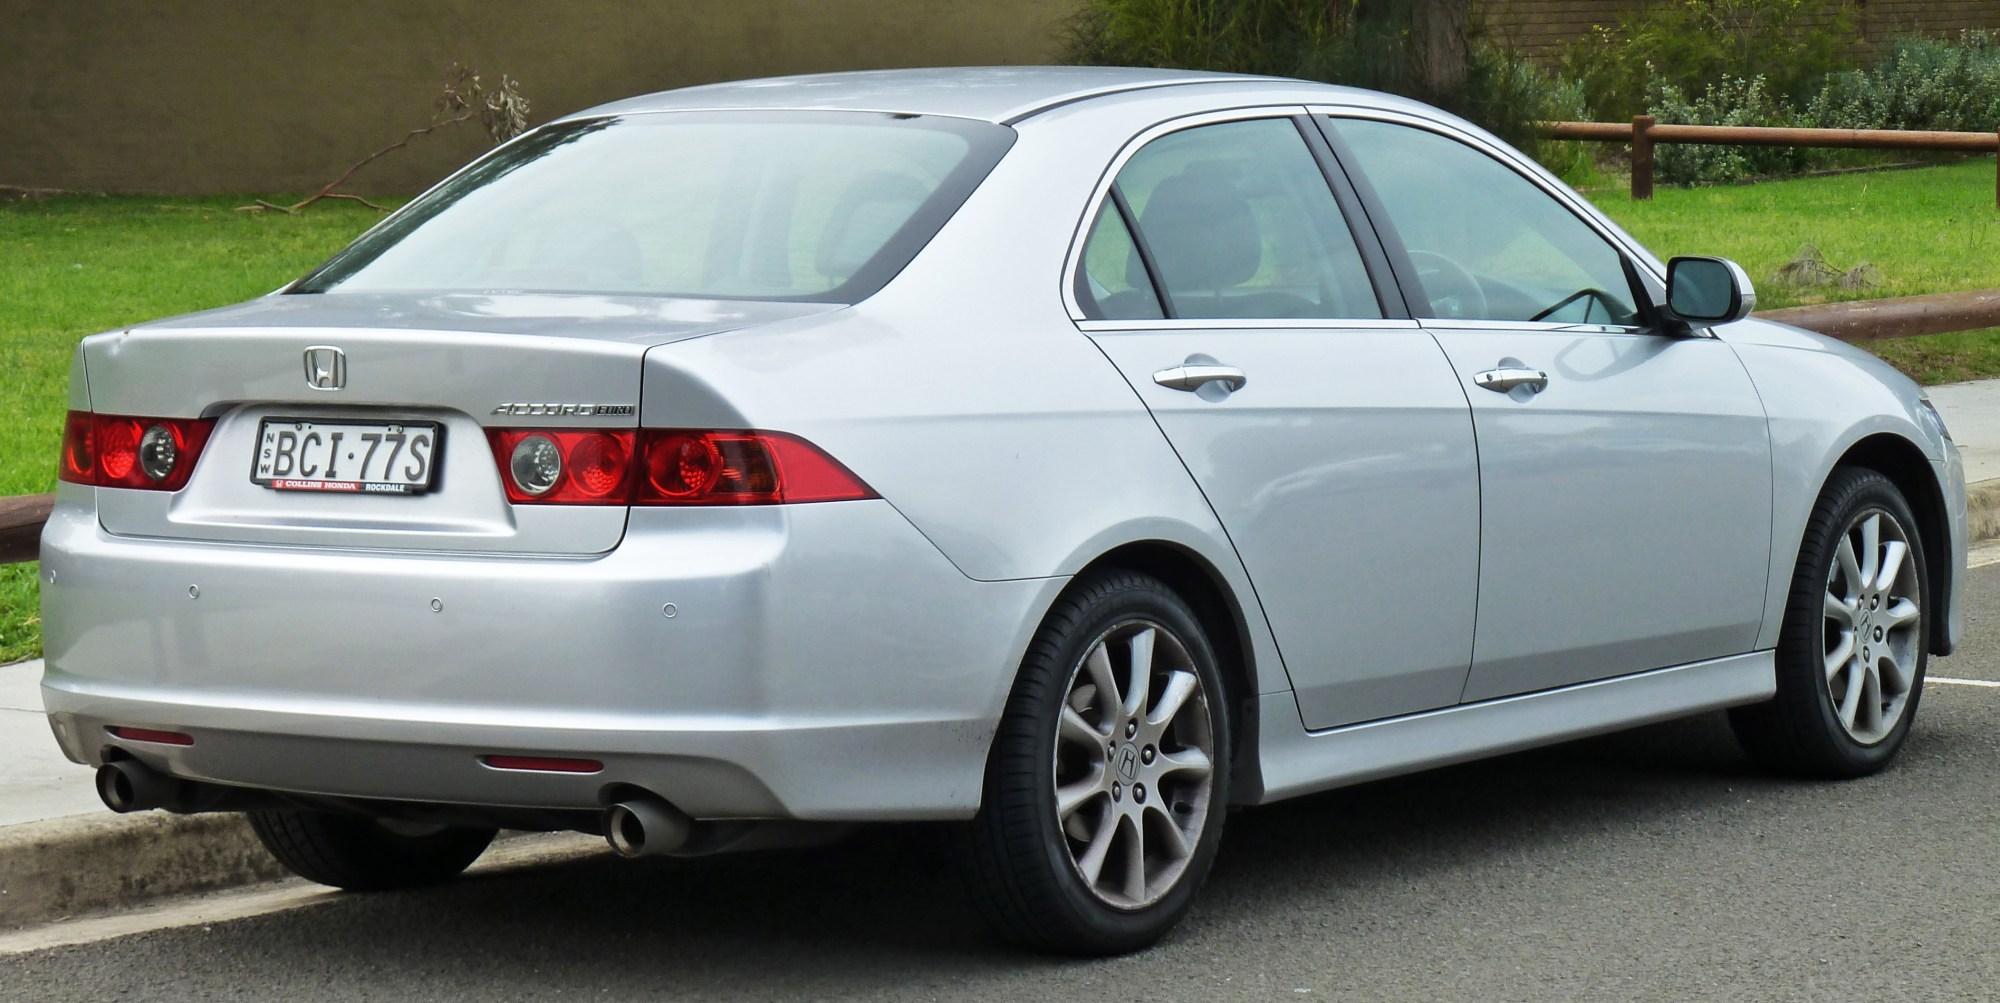 hight resolution of file 2005 2008 honda accord euro luxury sedan 02 jpg